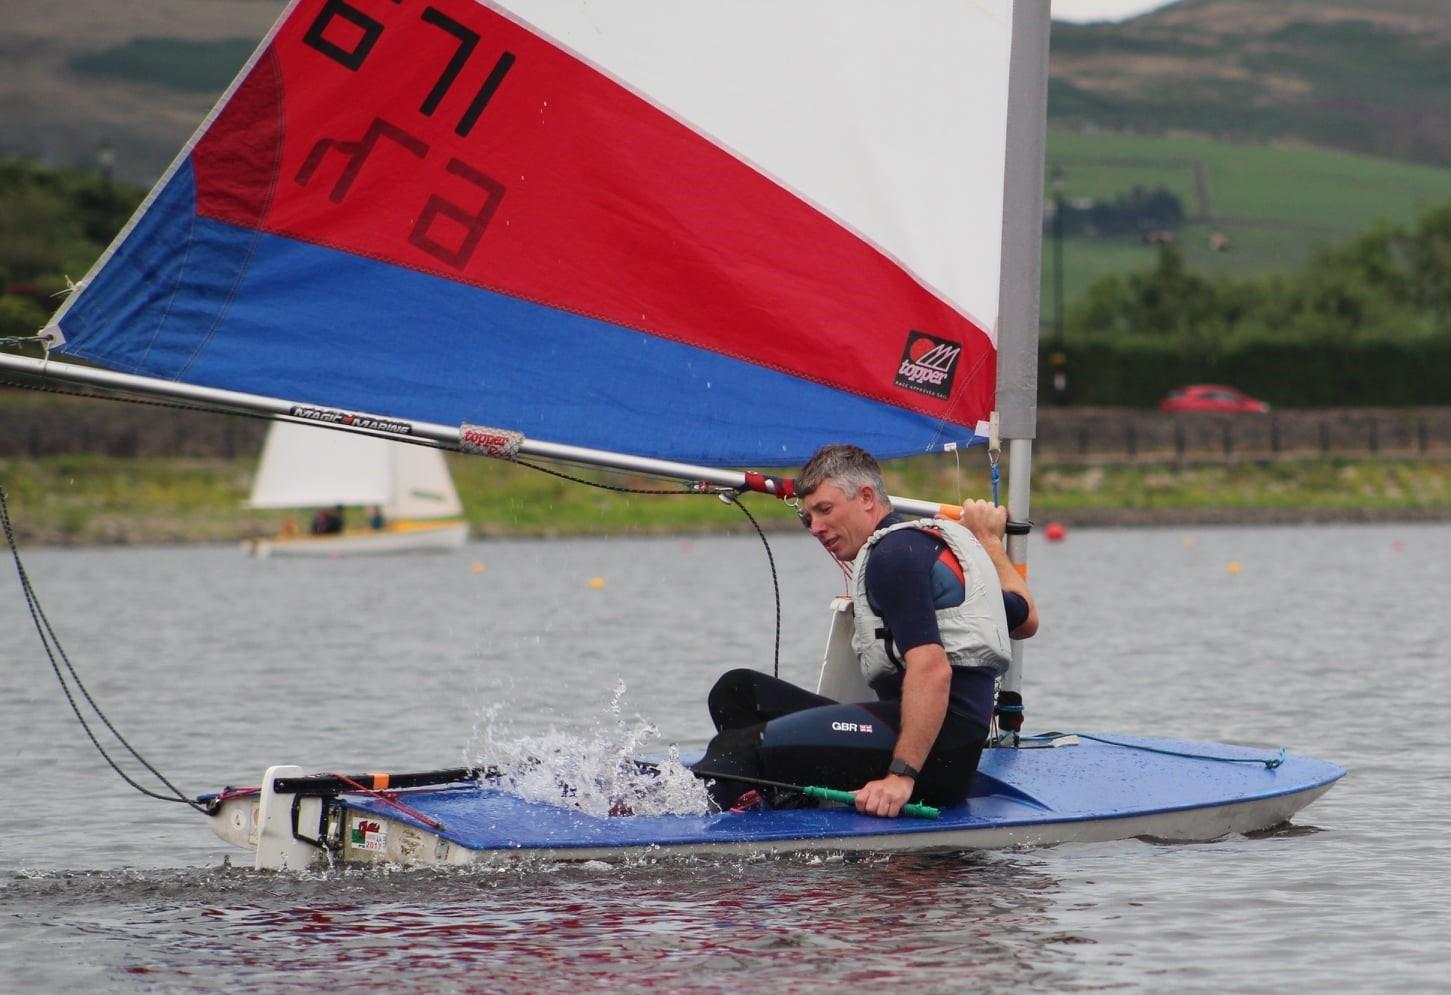 Stuart-Bithell-His-boat-sprang-a-leak